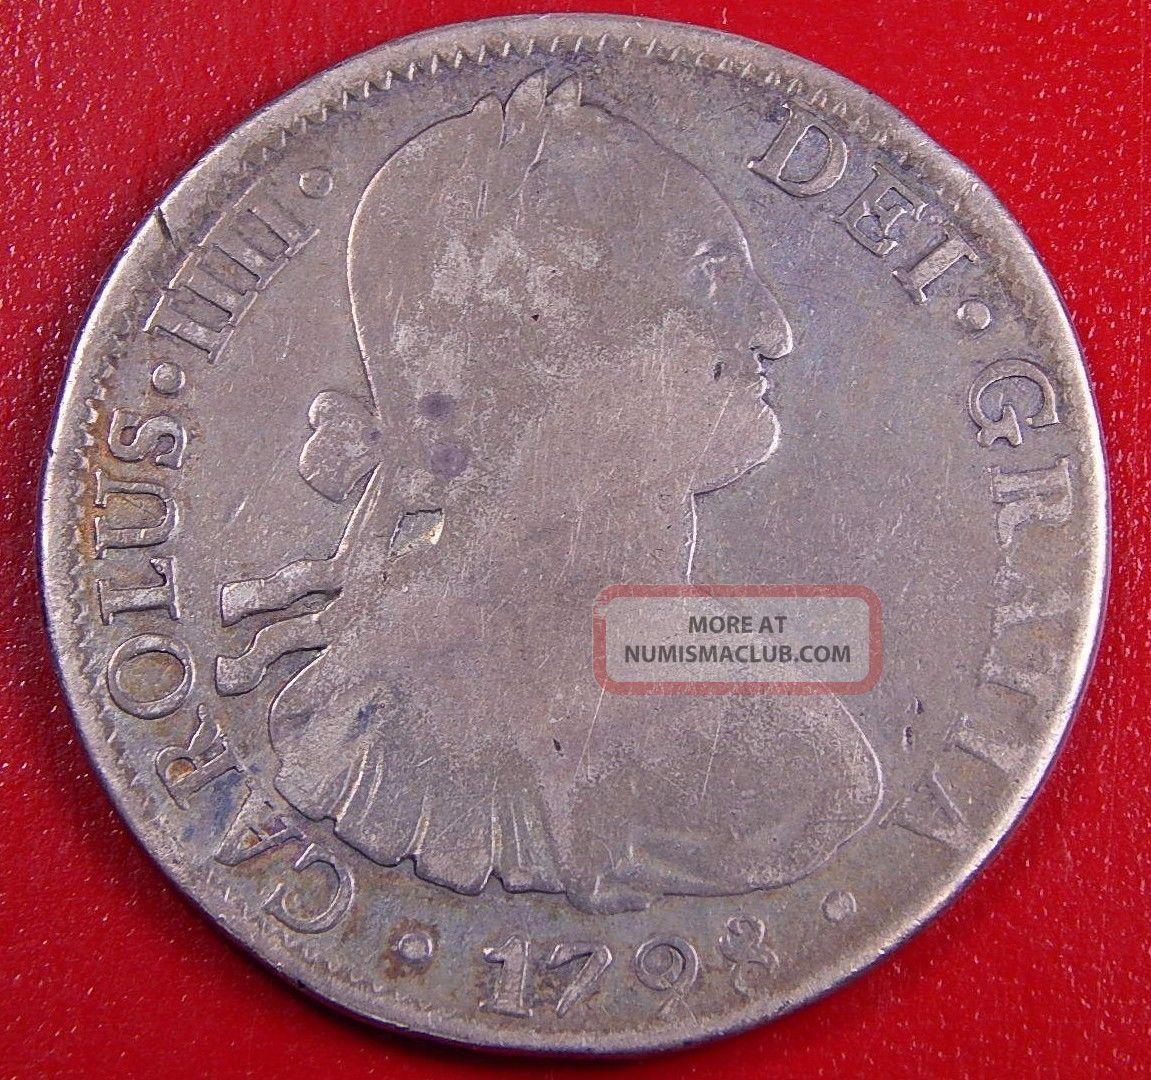 1798 Mexico 1 Real Carolus Iiii Dei Gratia Silver Mexican